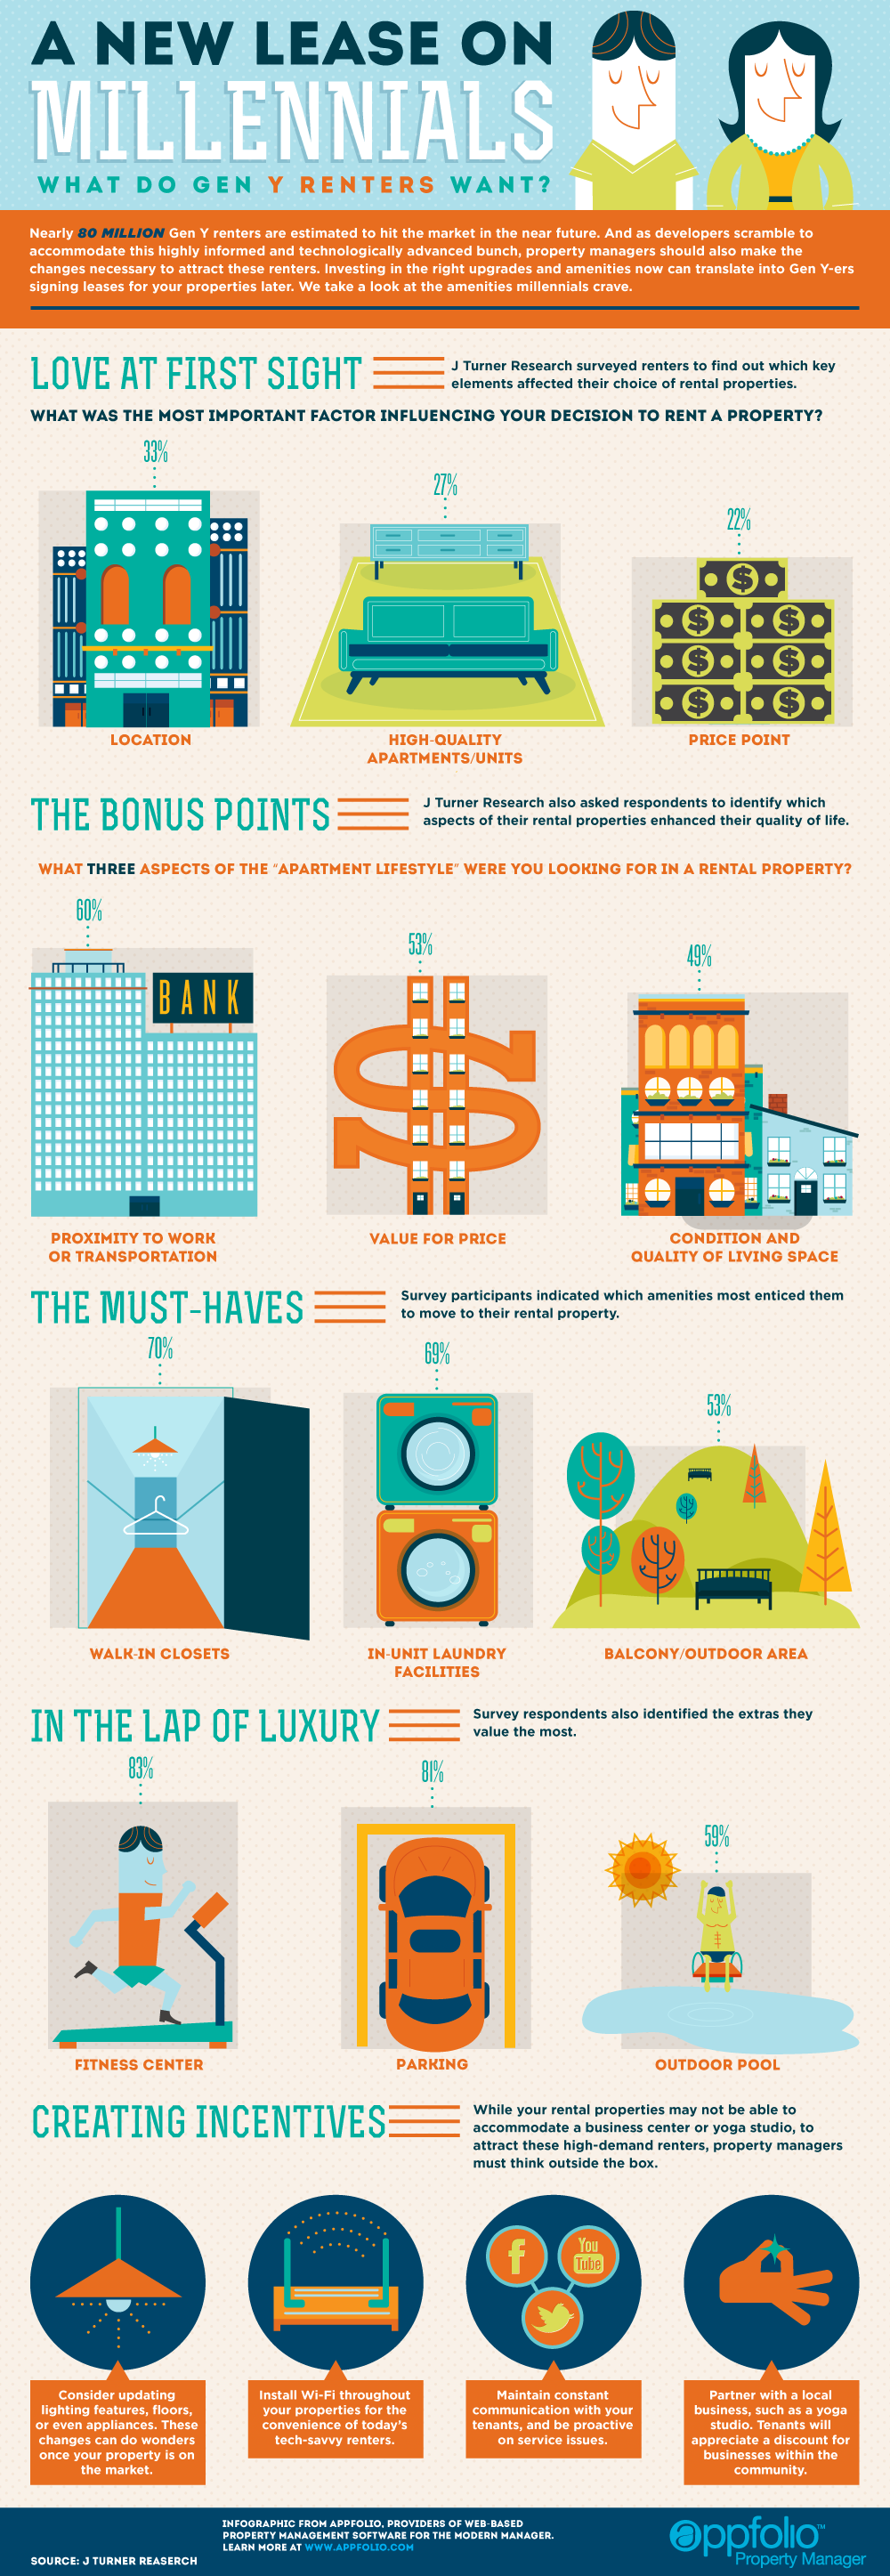 Millennial Renters: Insight From Property Management, Washington D.C.